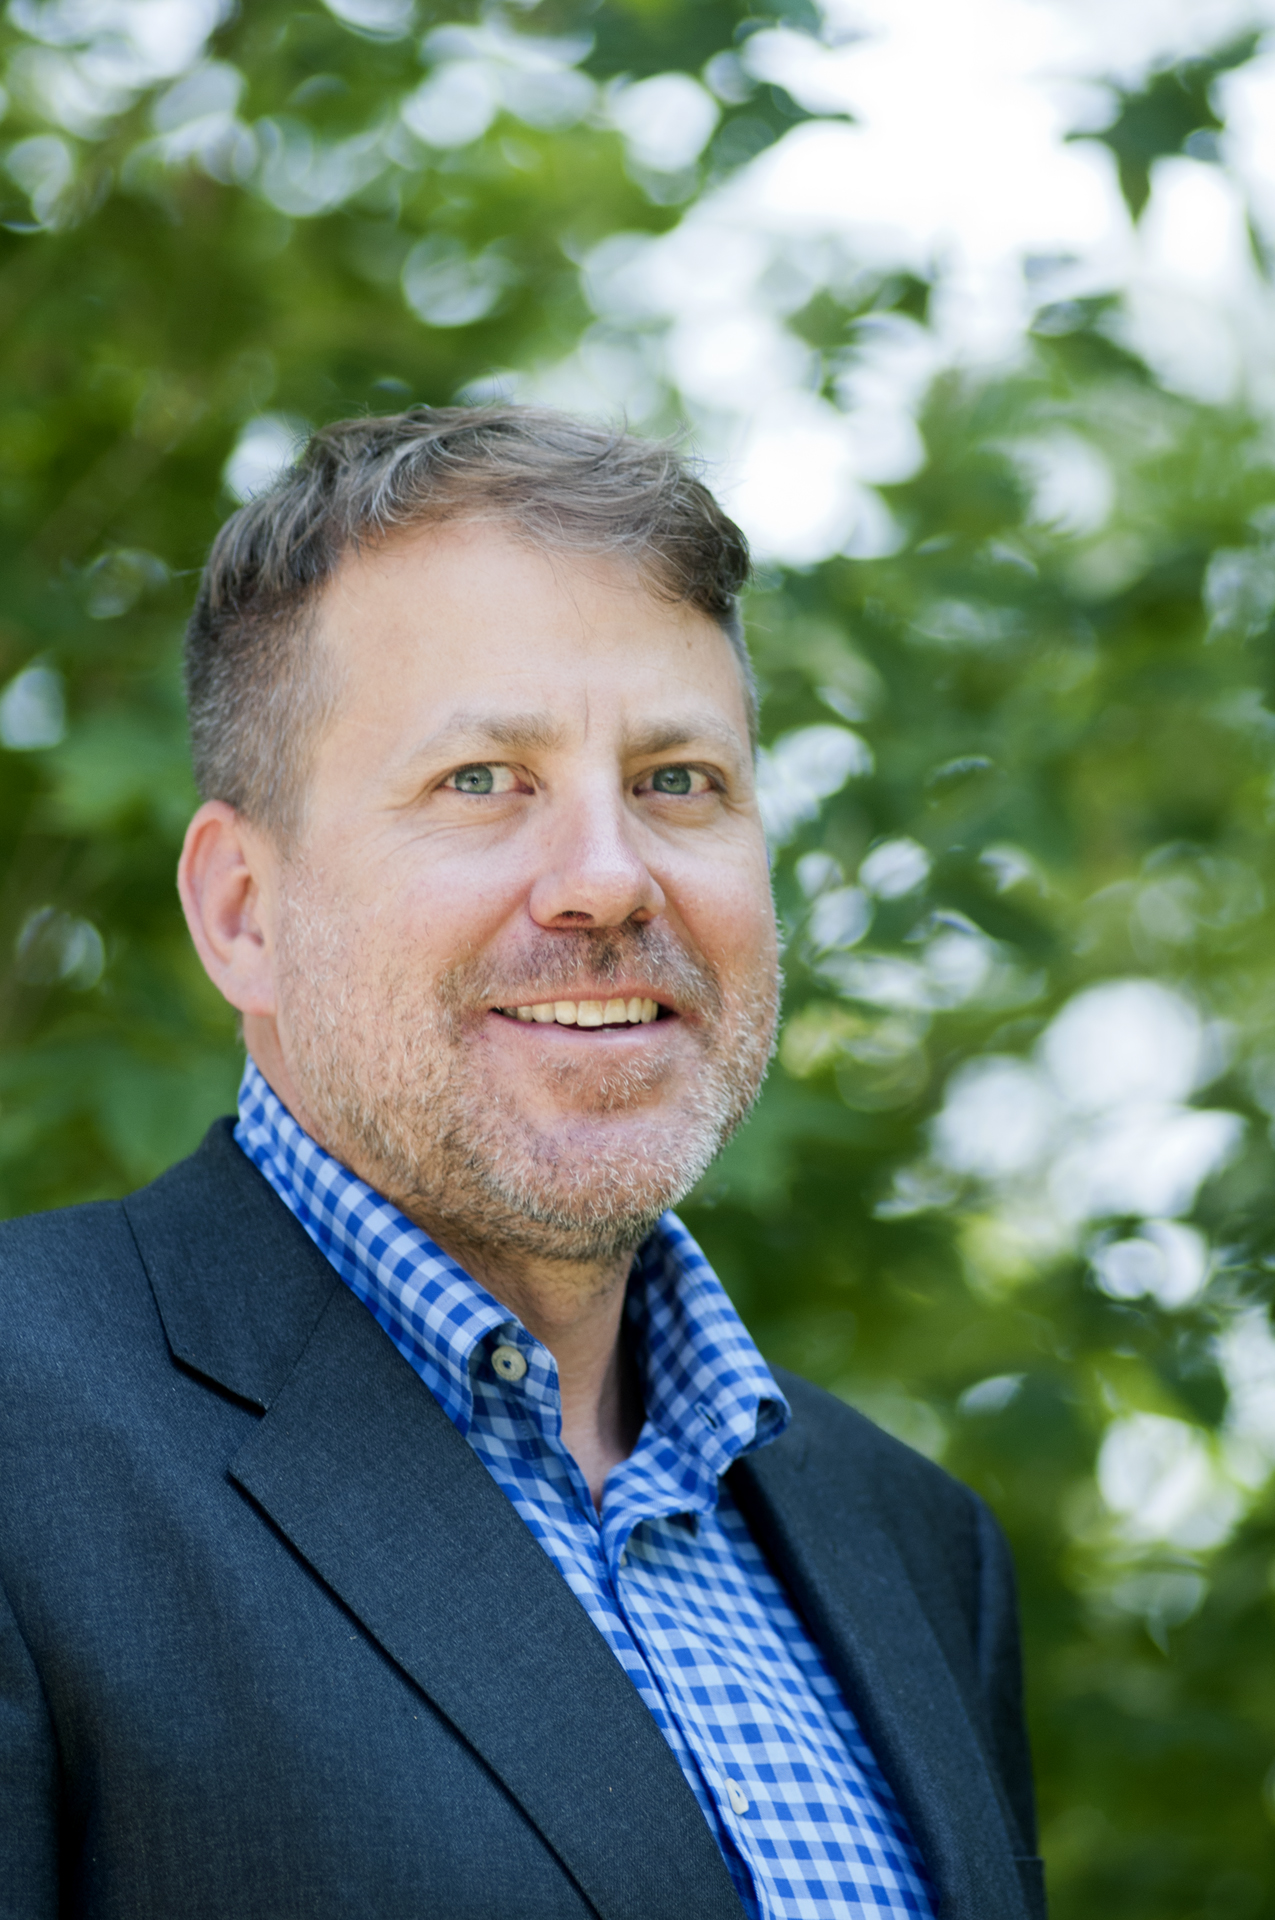 Michael Green, CEO, Enzoic